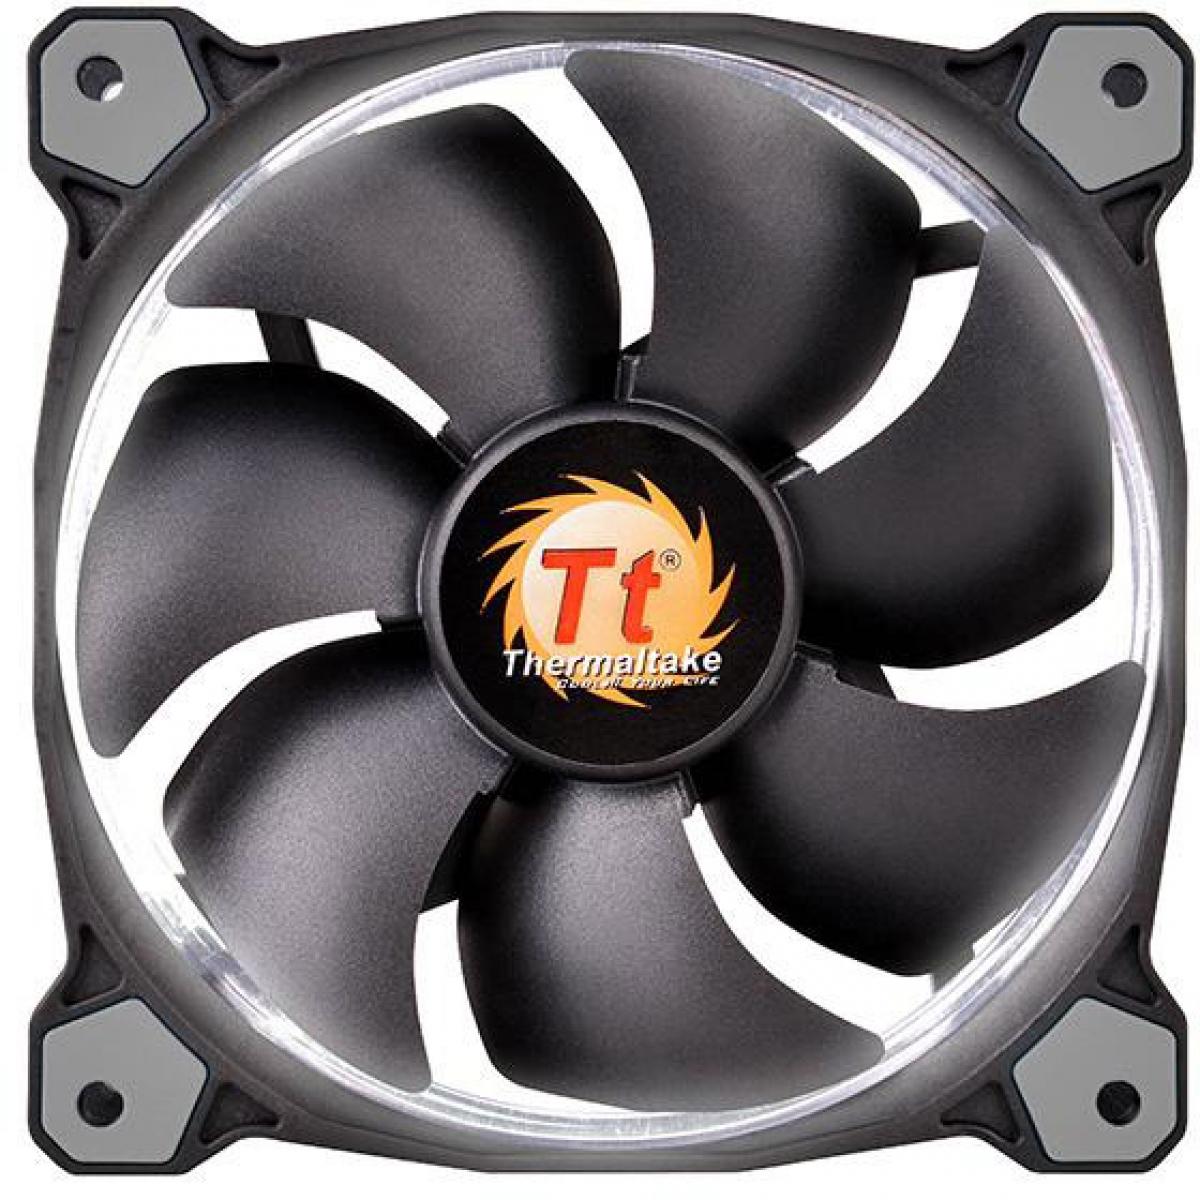 Kit Fan com 3 Unidades Thermaltake Riing 12, LED White 120mm, CL-F055-PL12WT-A